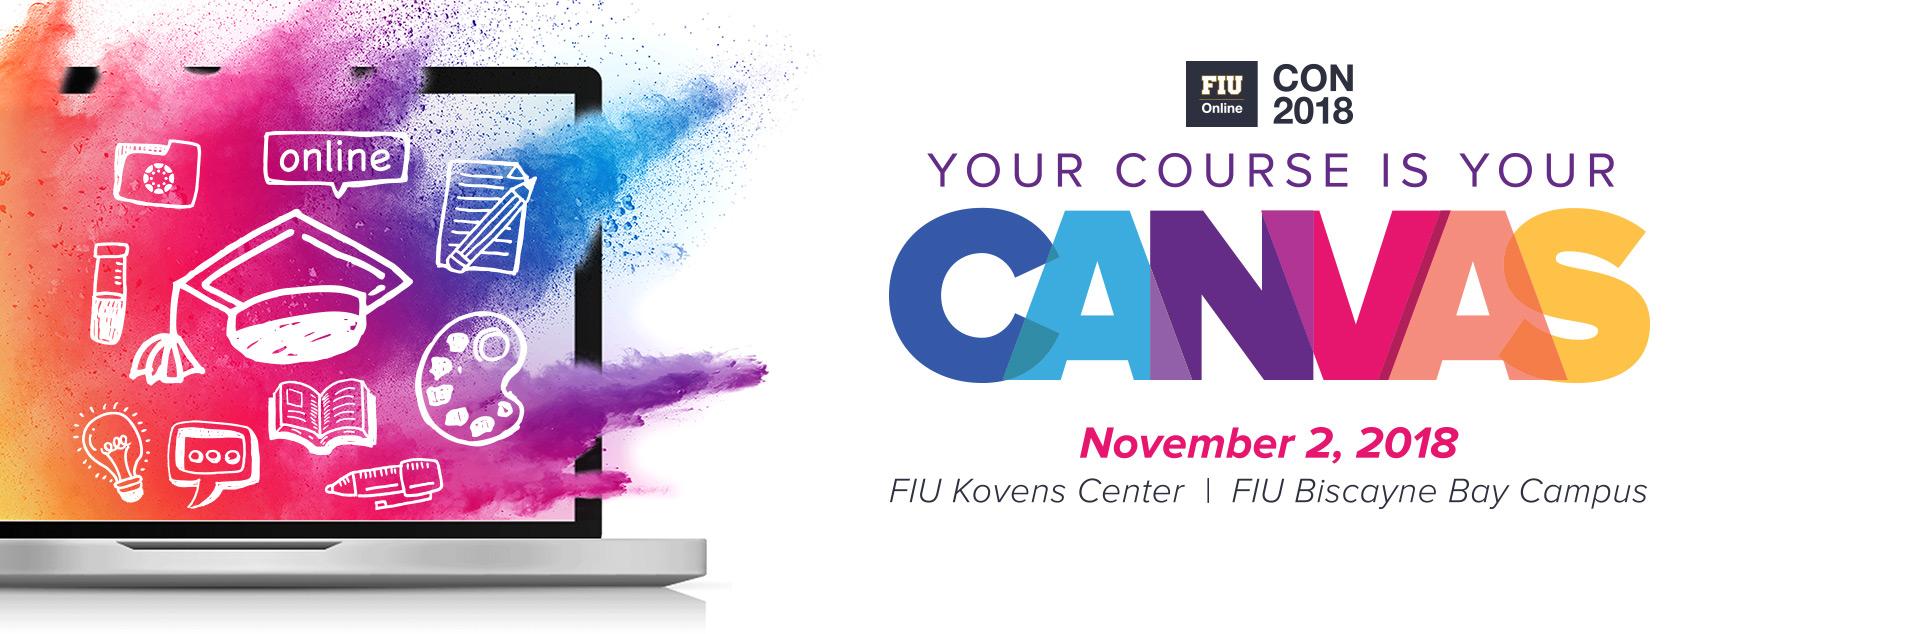 FIU Online Con 2018